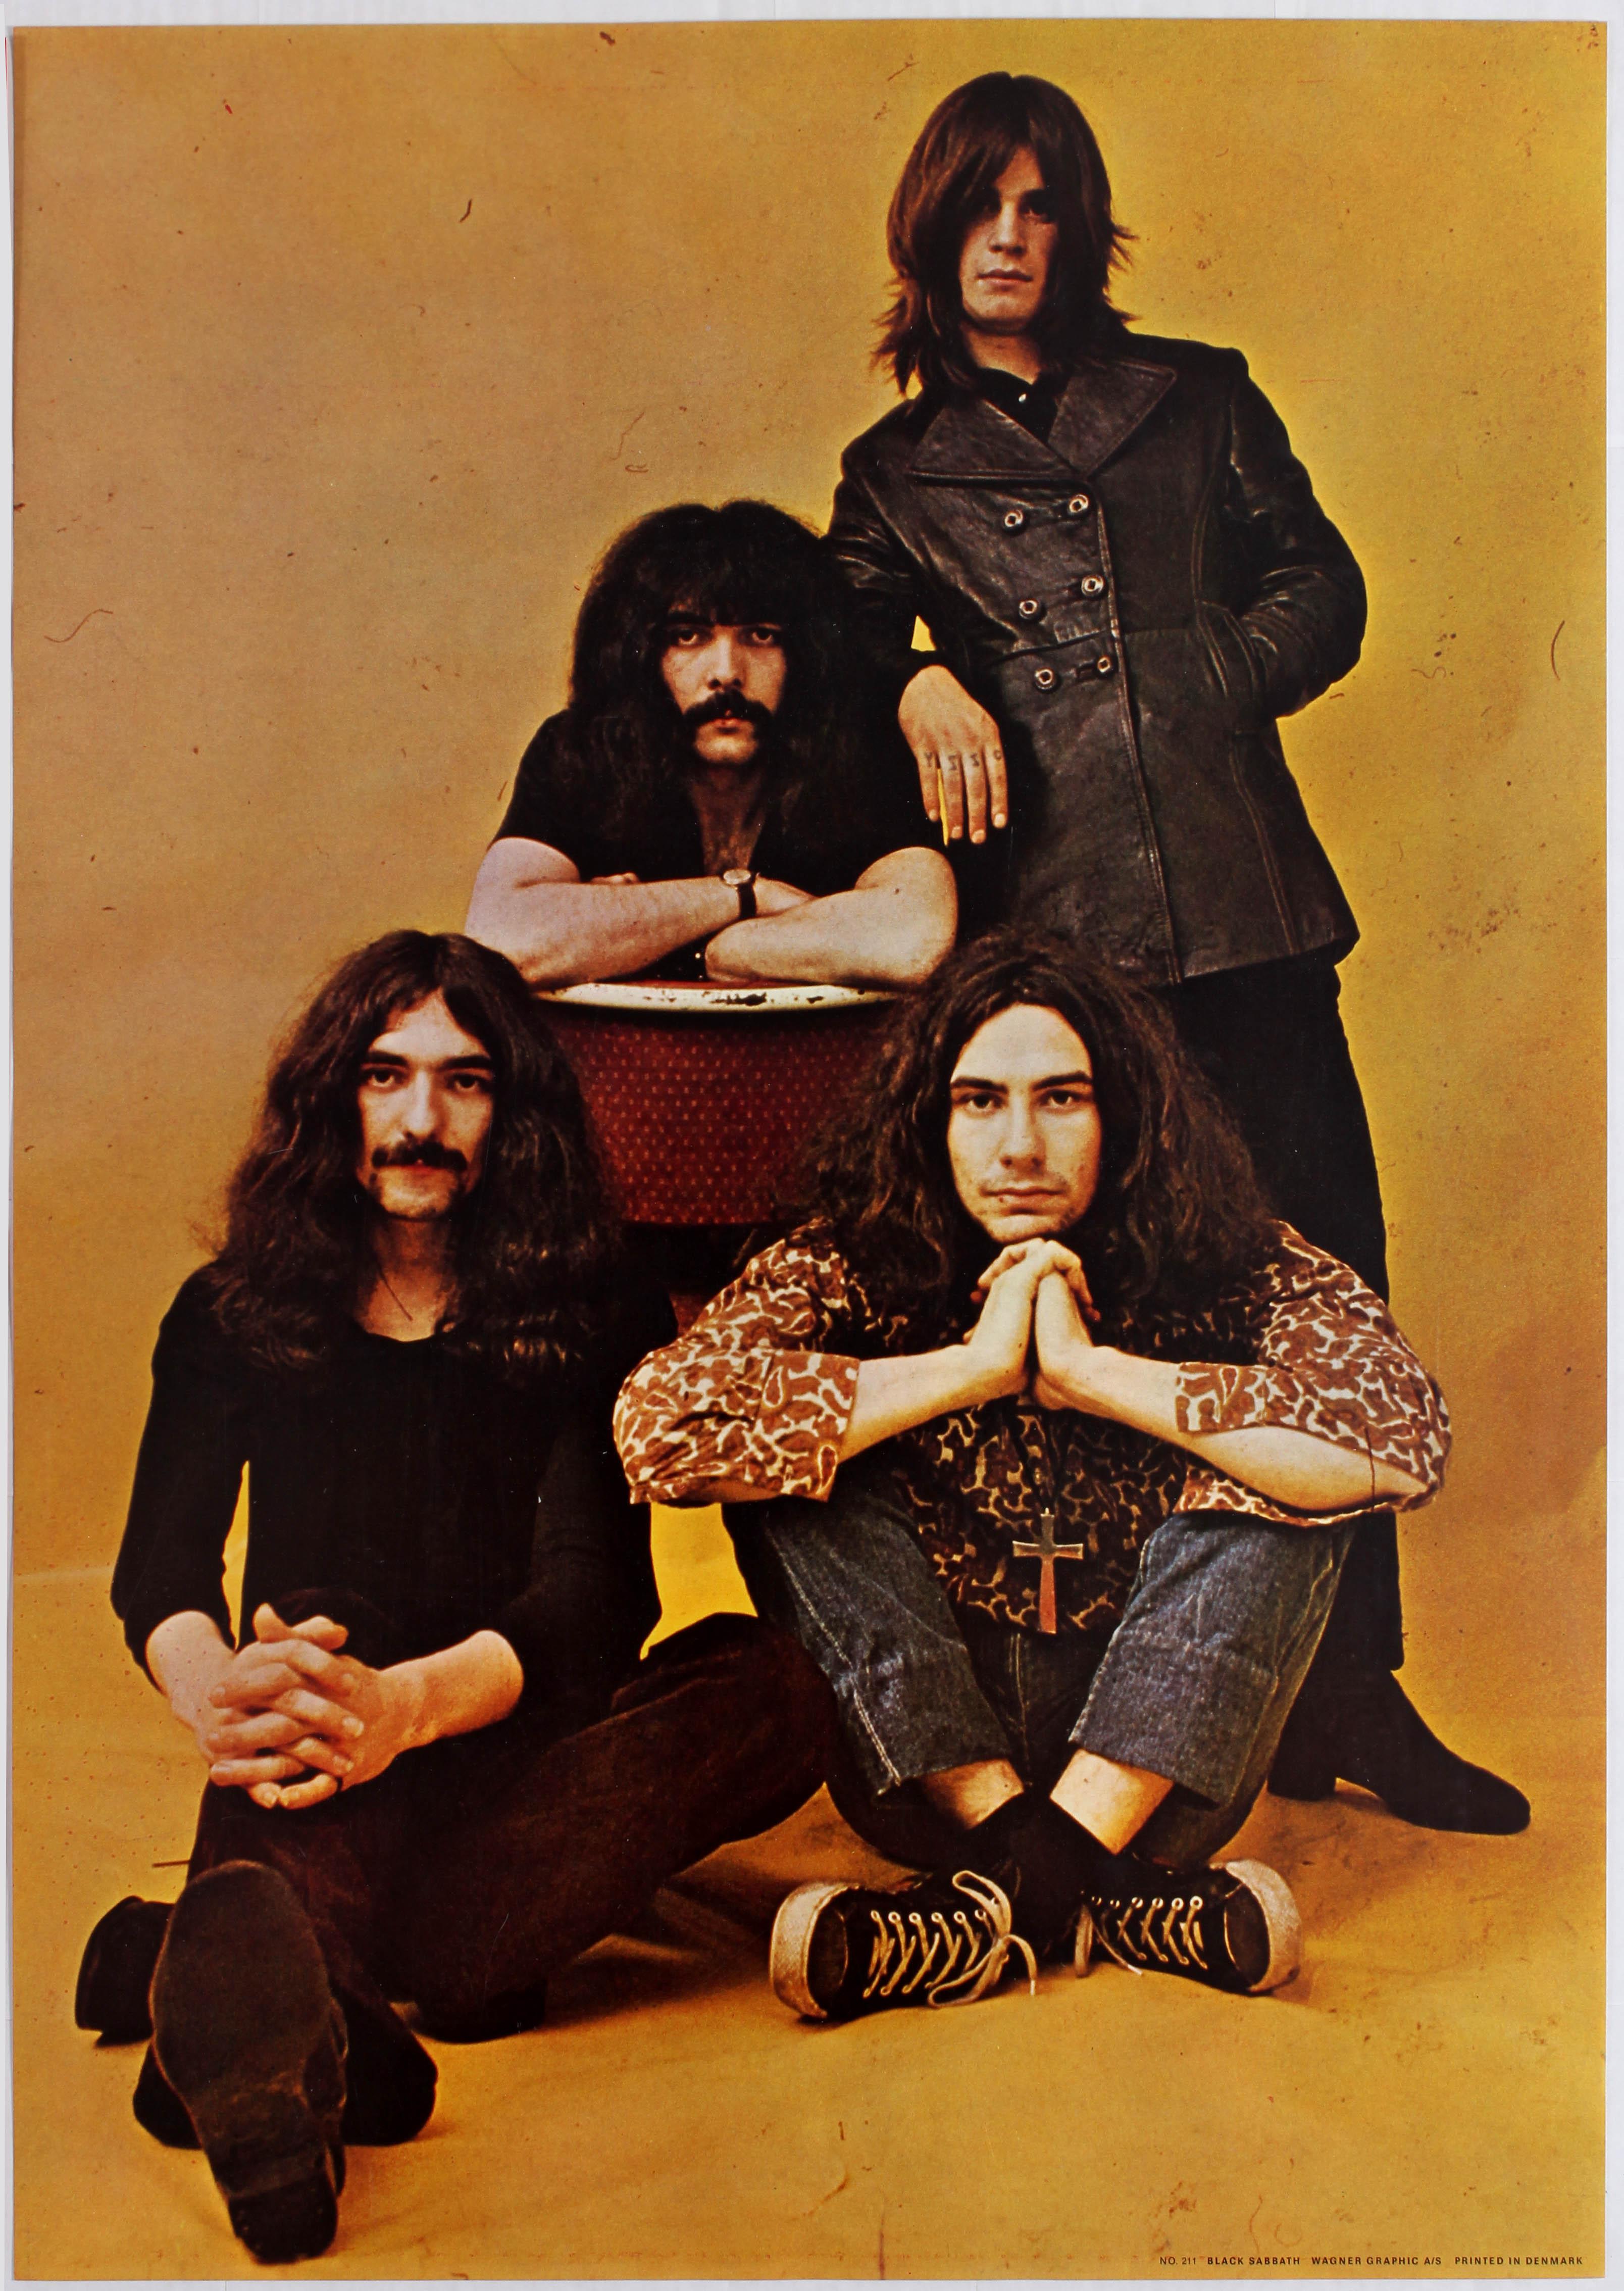 Lot 1706 - Advertising Poster Black Sabbath